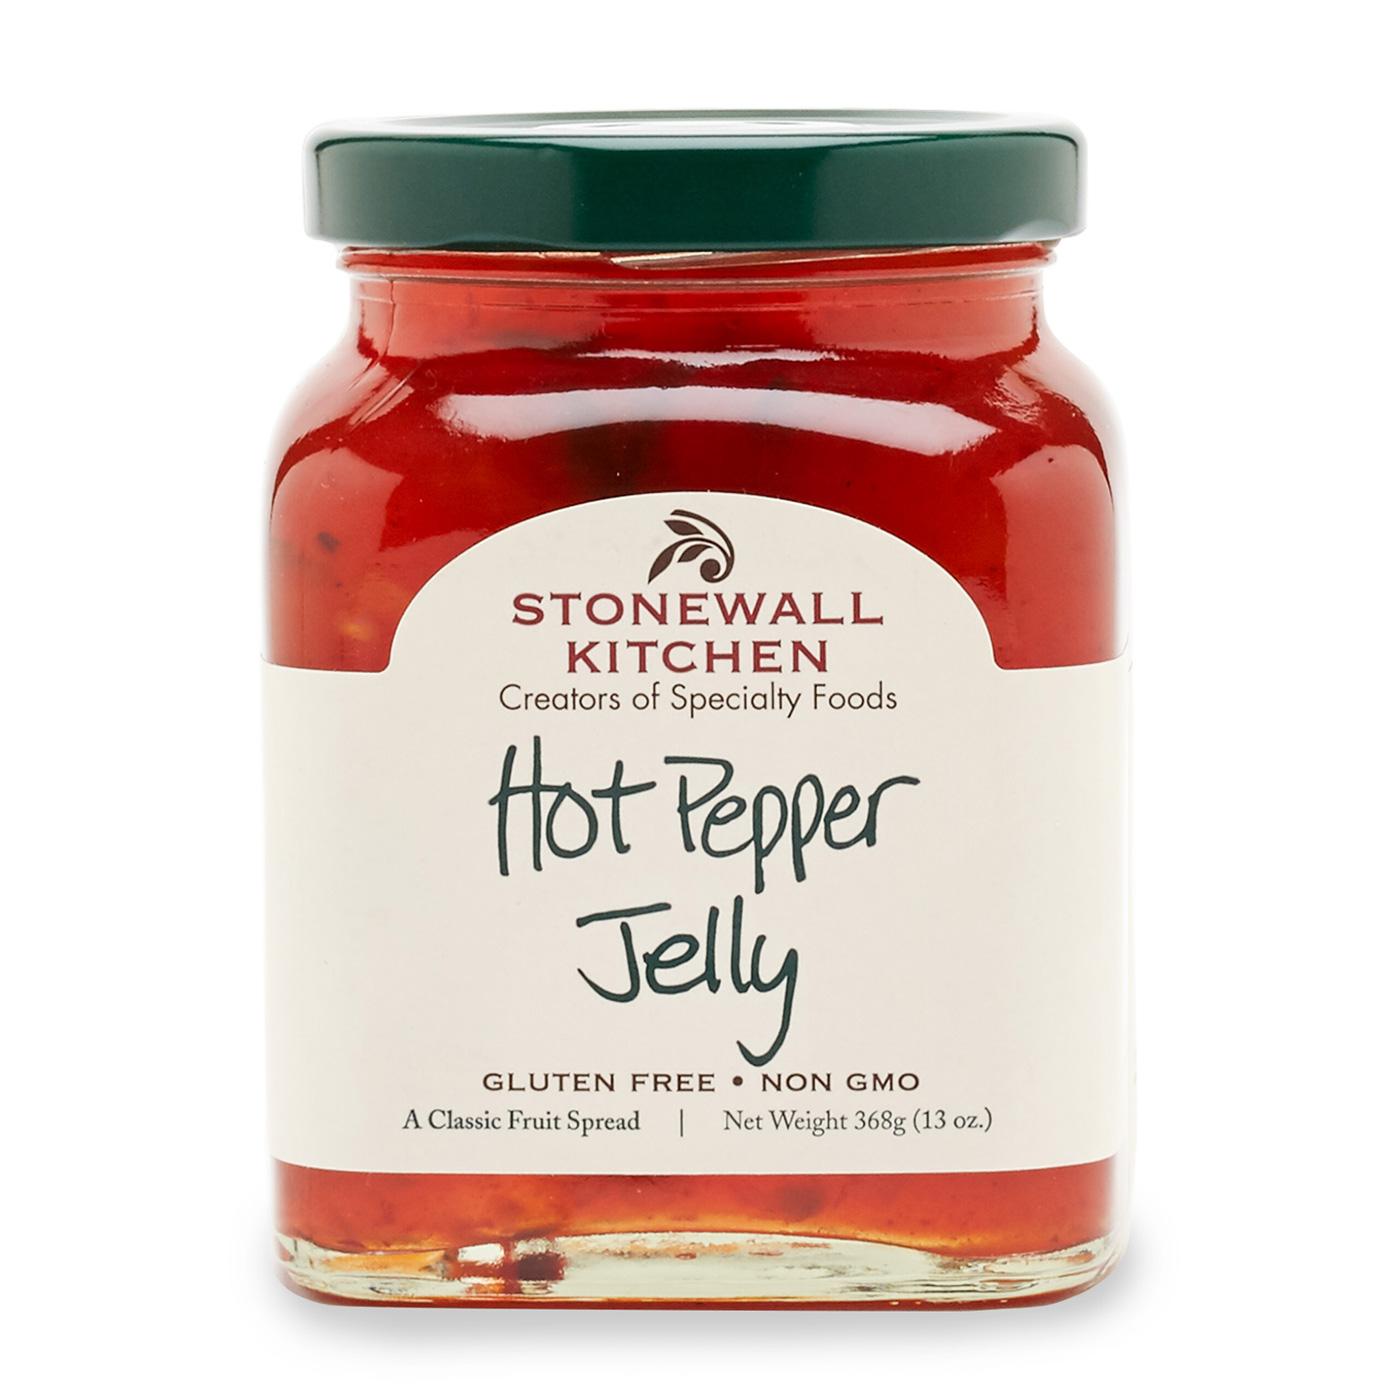 Stonewall Kitchen Apple Jalapeno Jelly Recipe